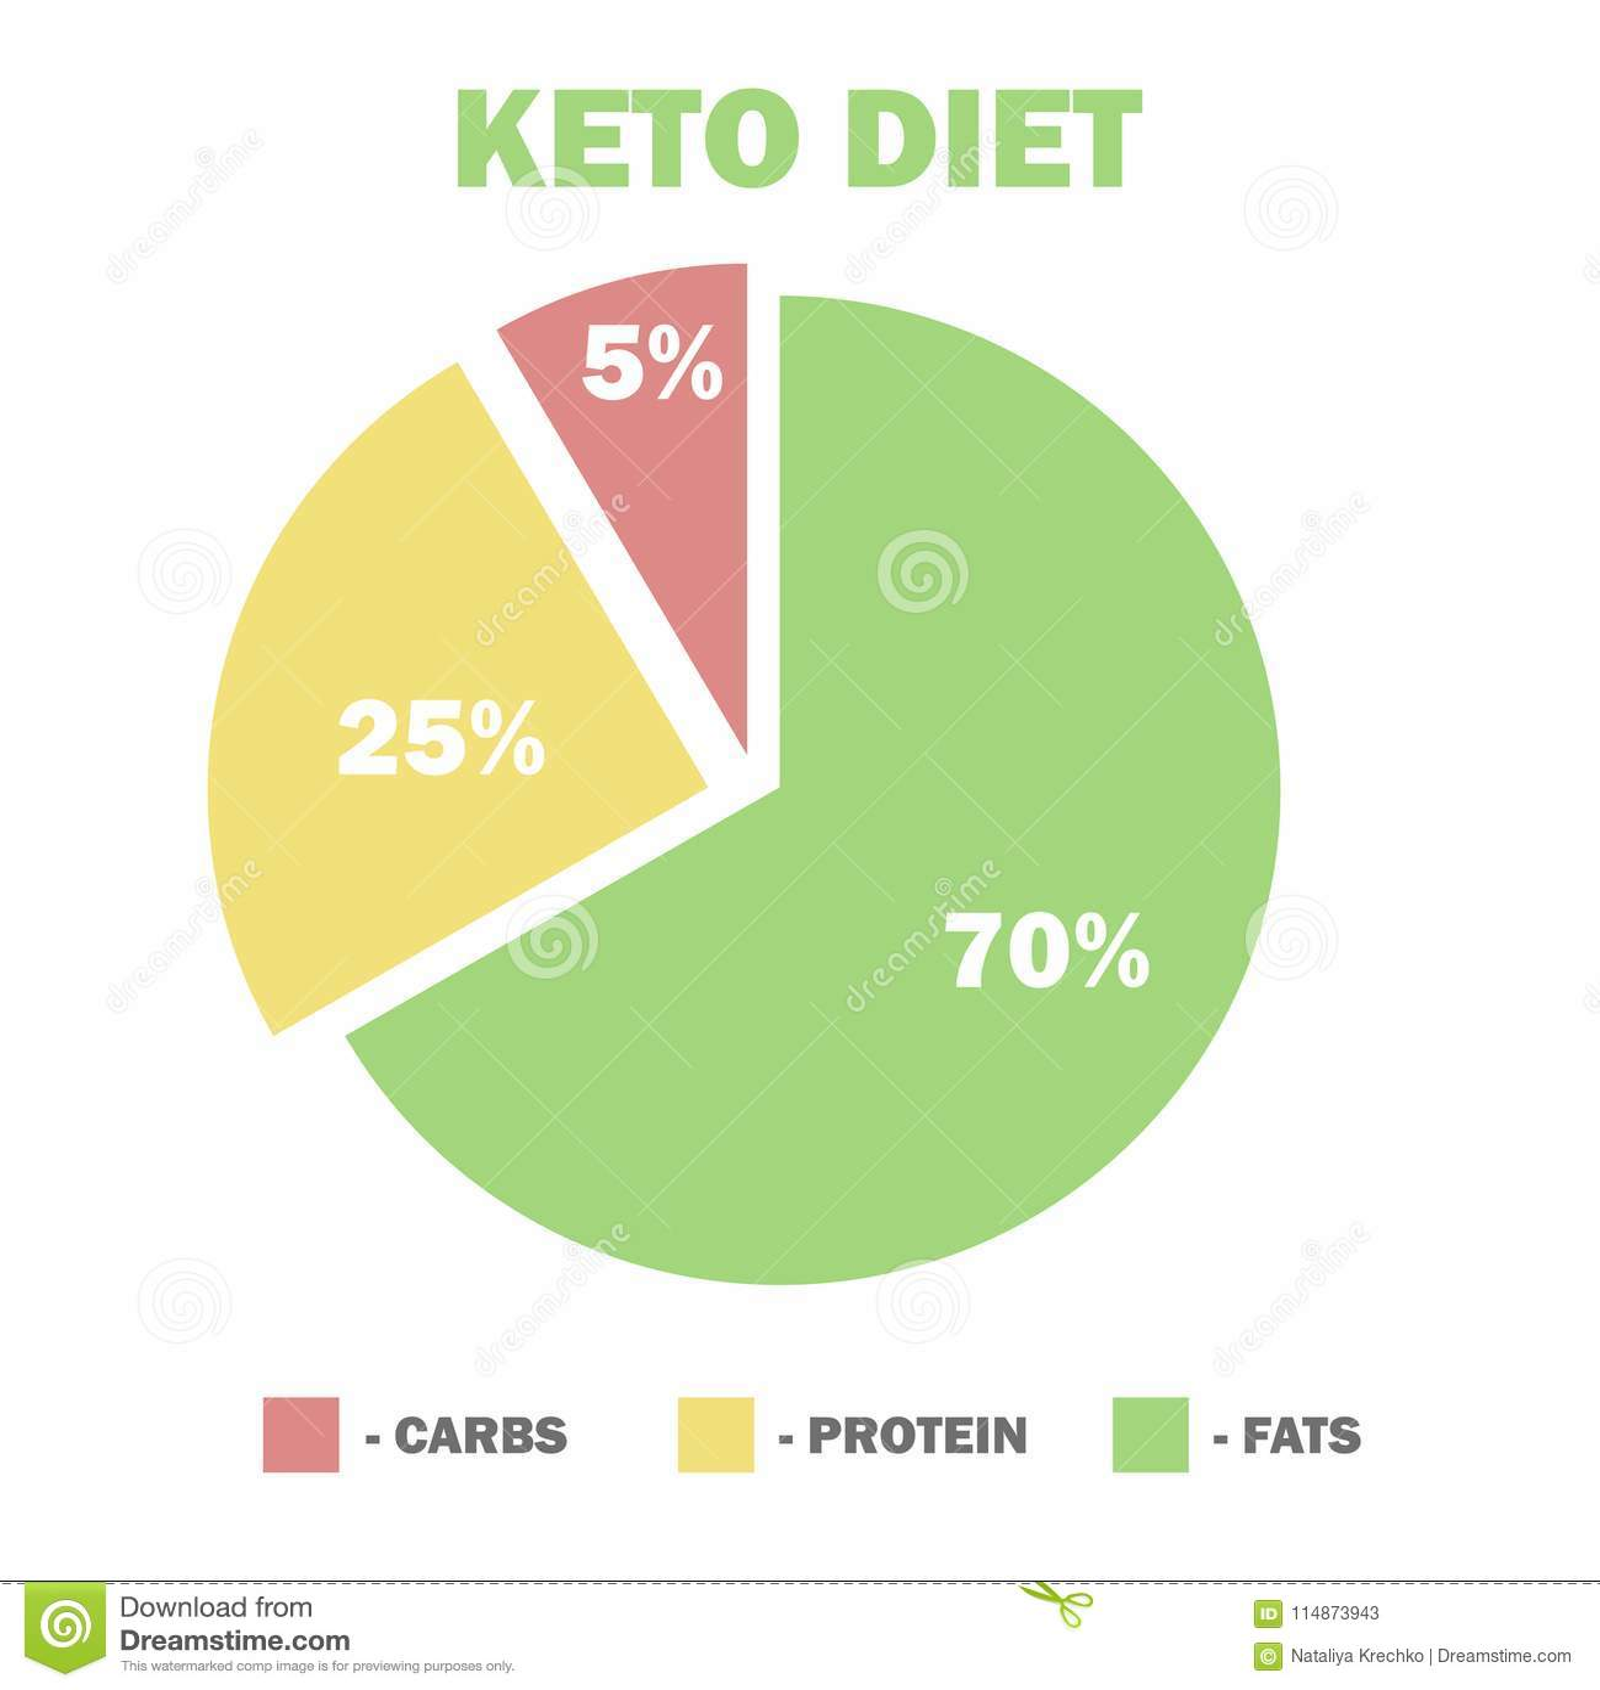 ketogenic diet macros diagram low carbs high healthy fat stock rh dreamstime com